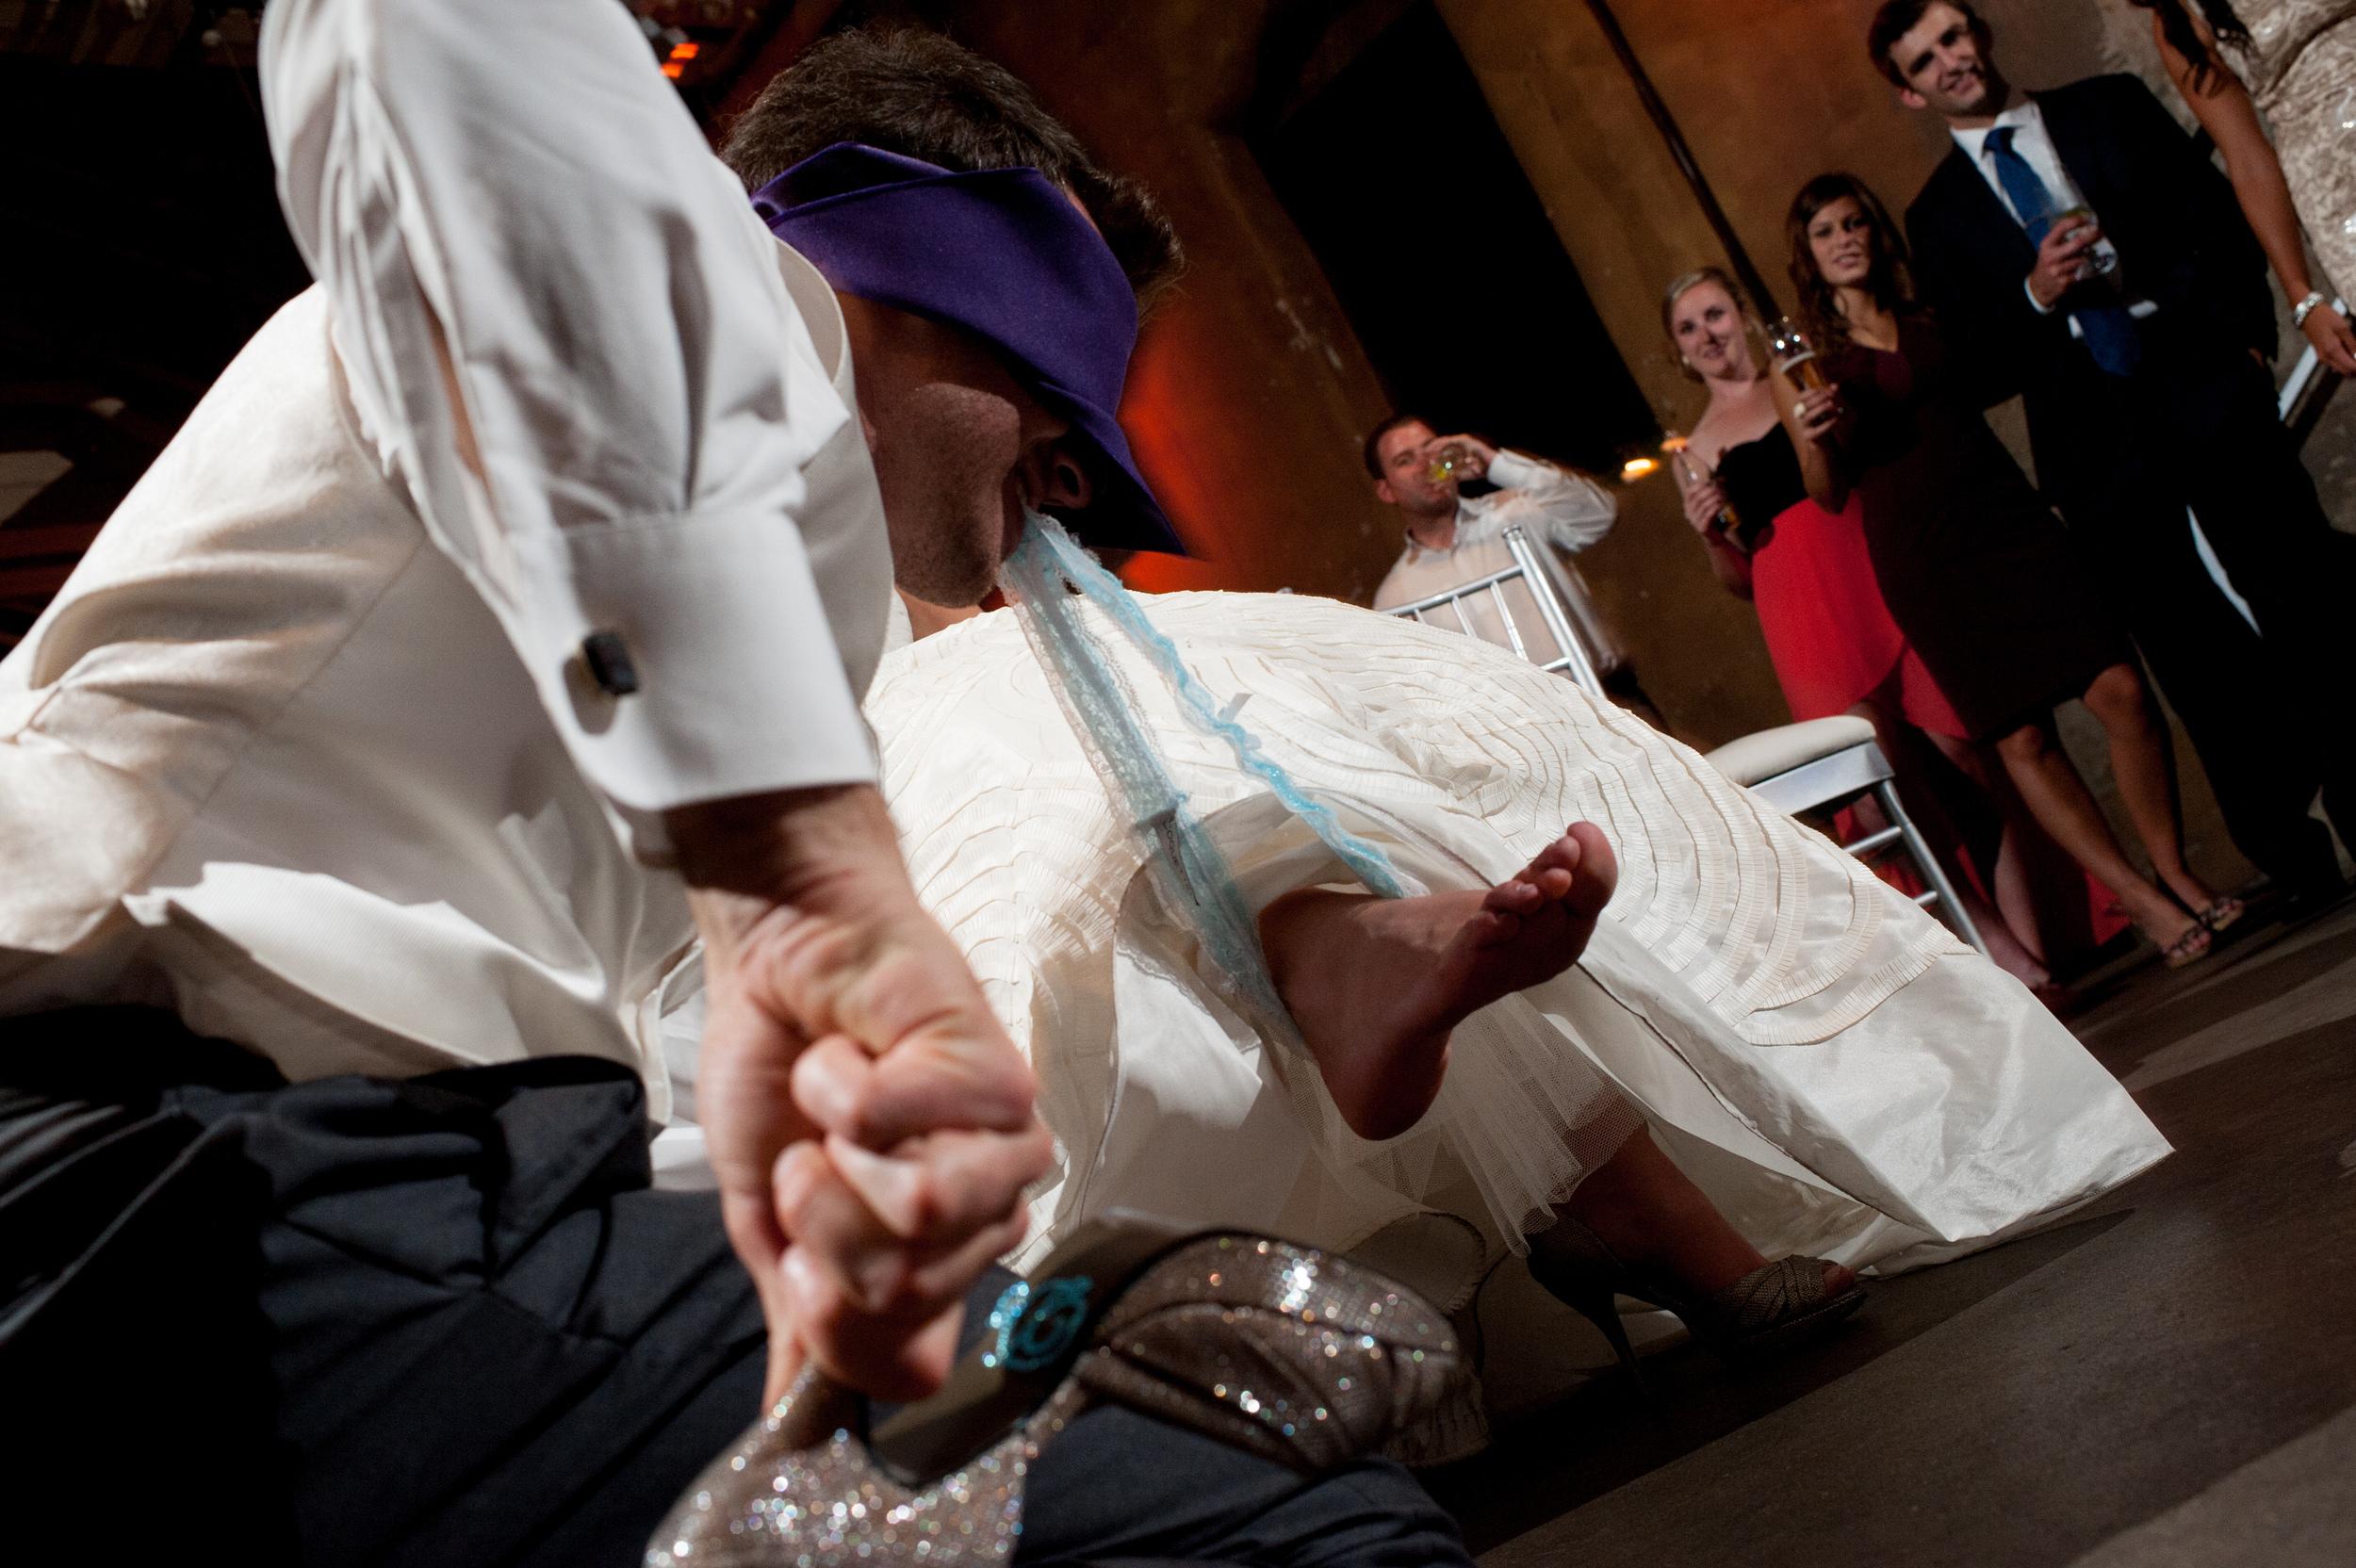 fermenting-cellar-toronto-wedding-011.jpg